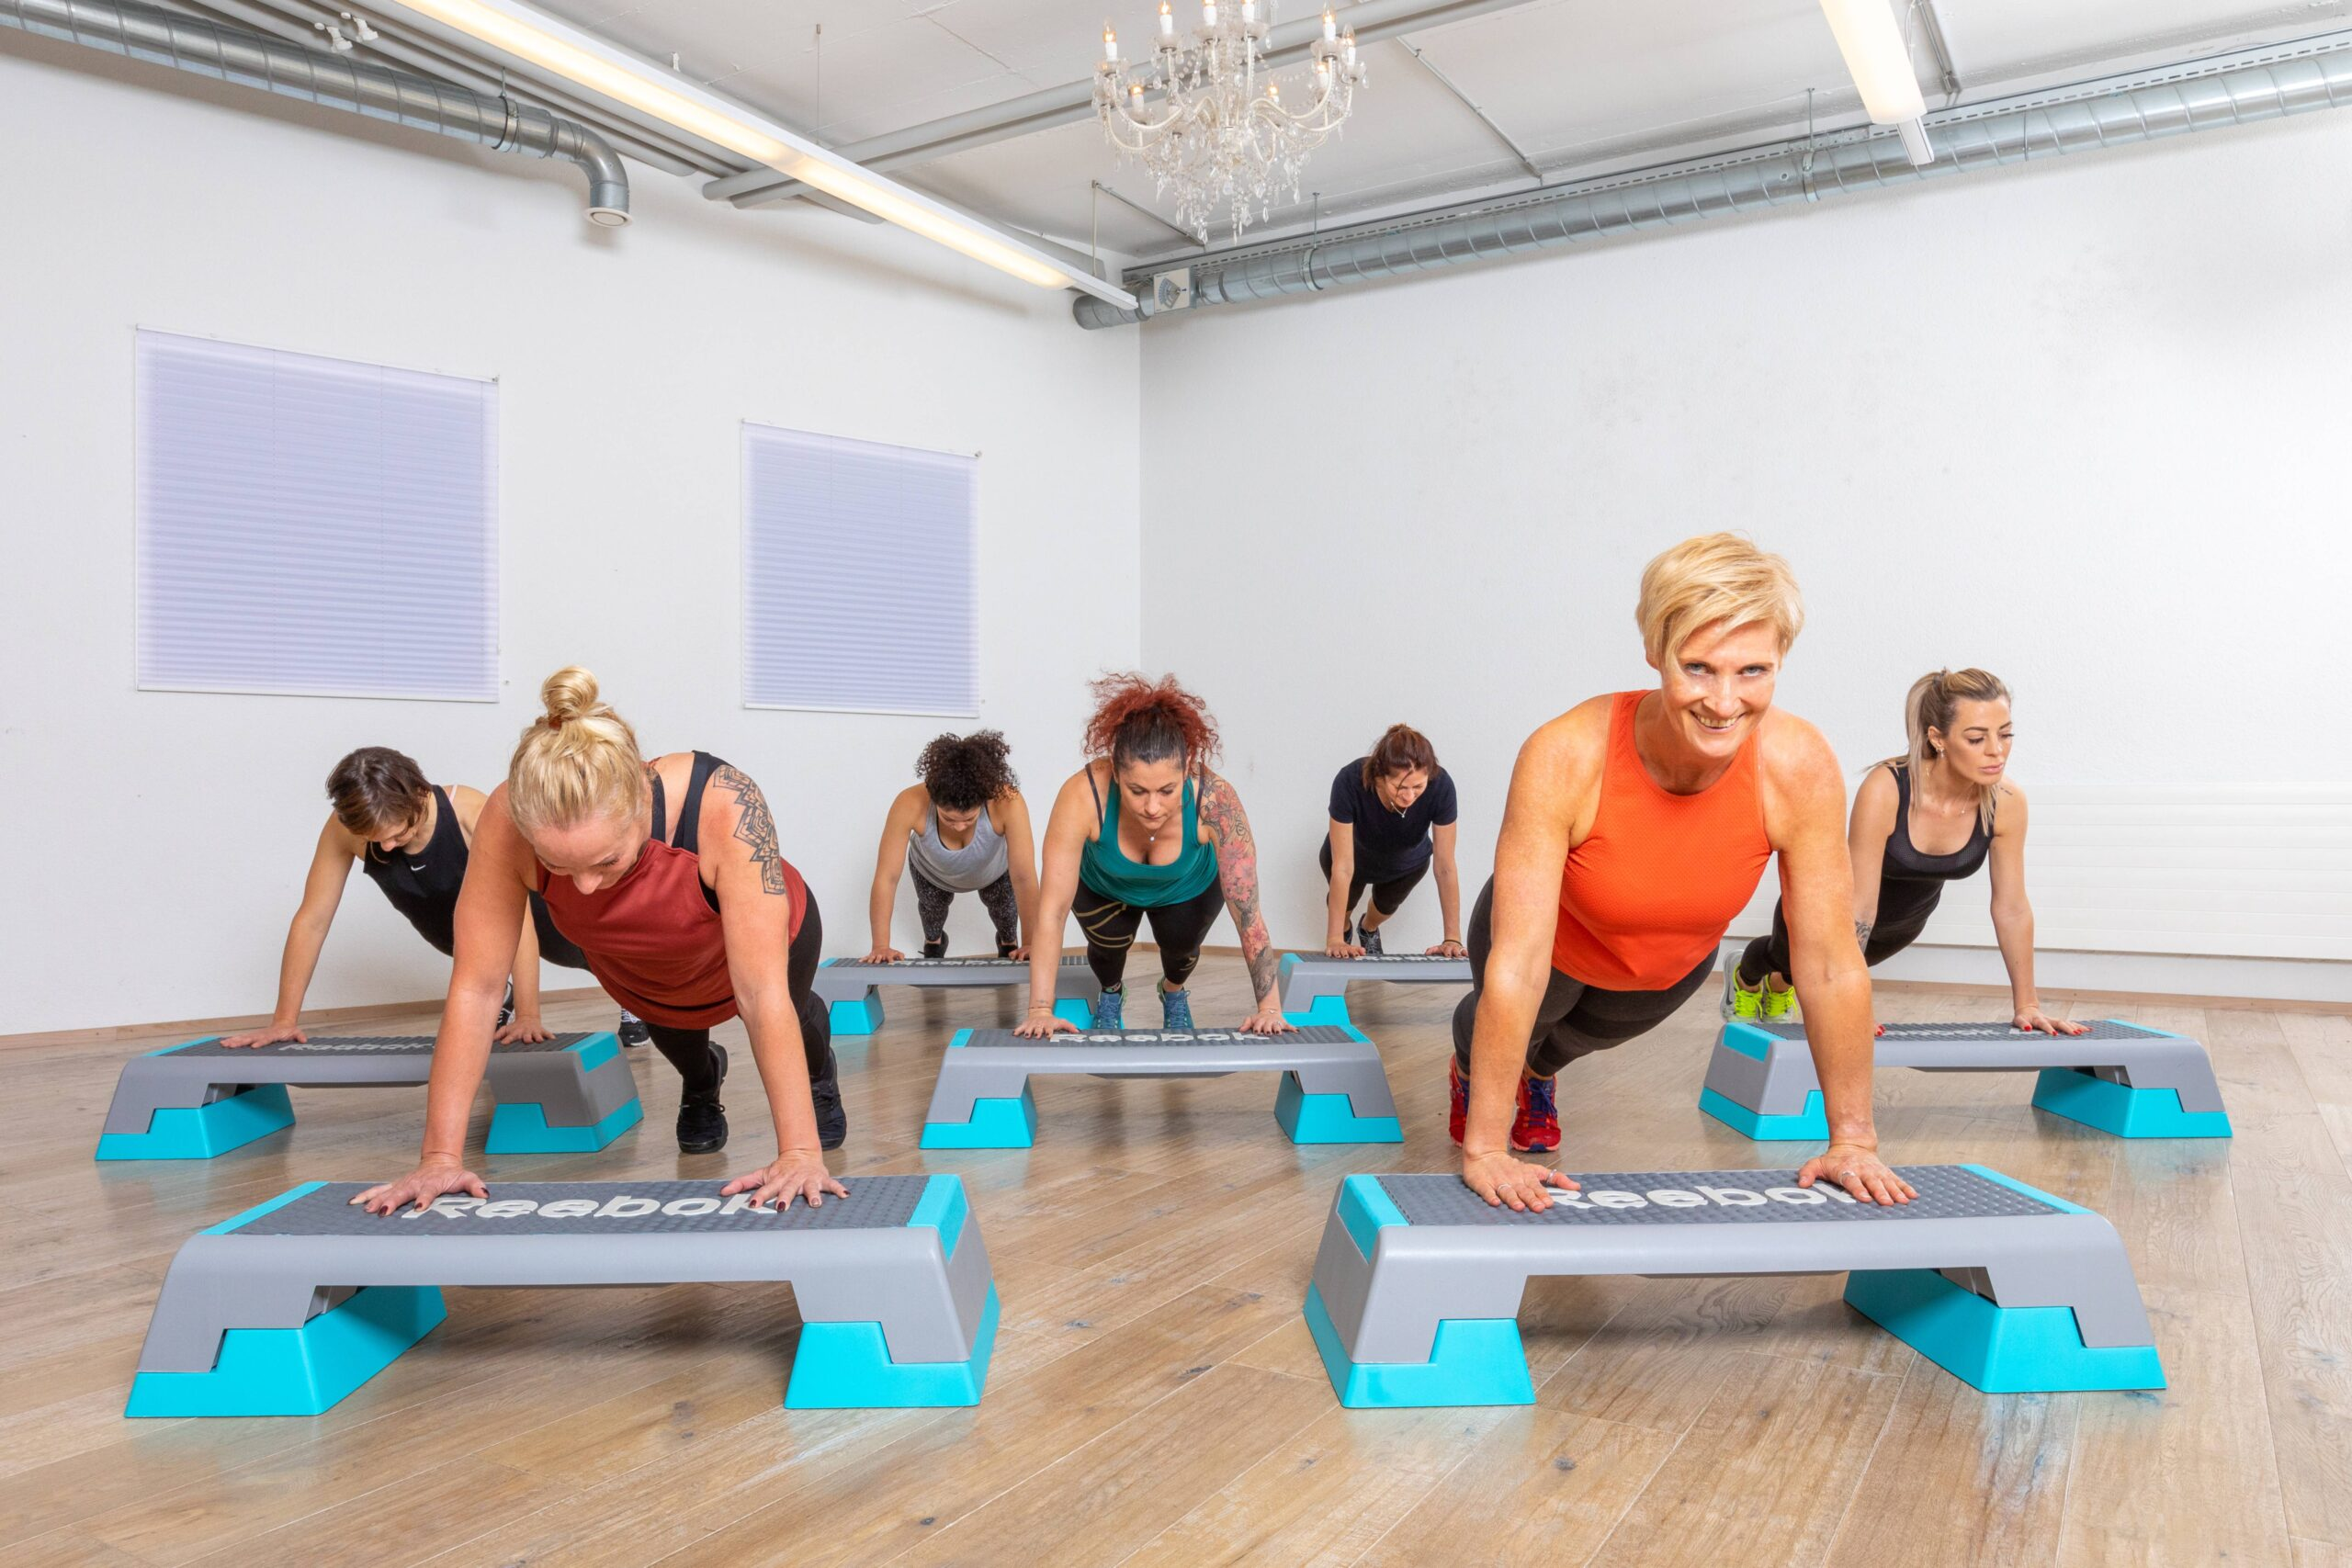 Functional Fitness Yvonne Bächli Vipfitstyle Albisrieden